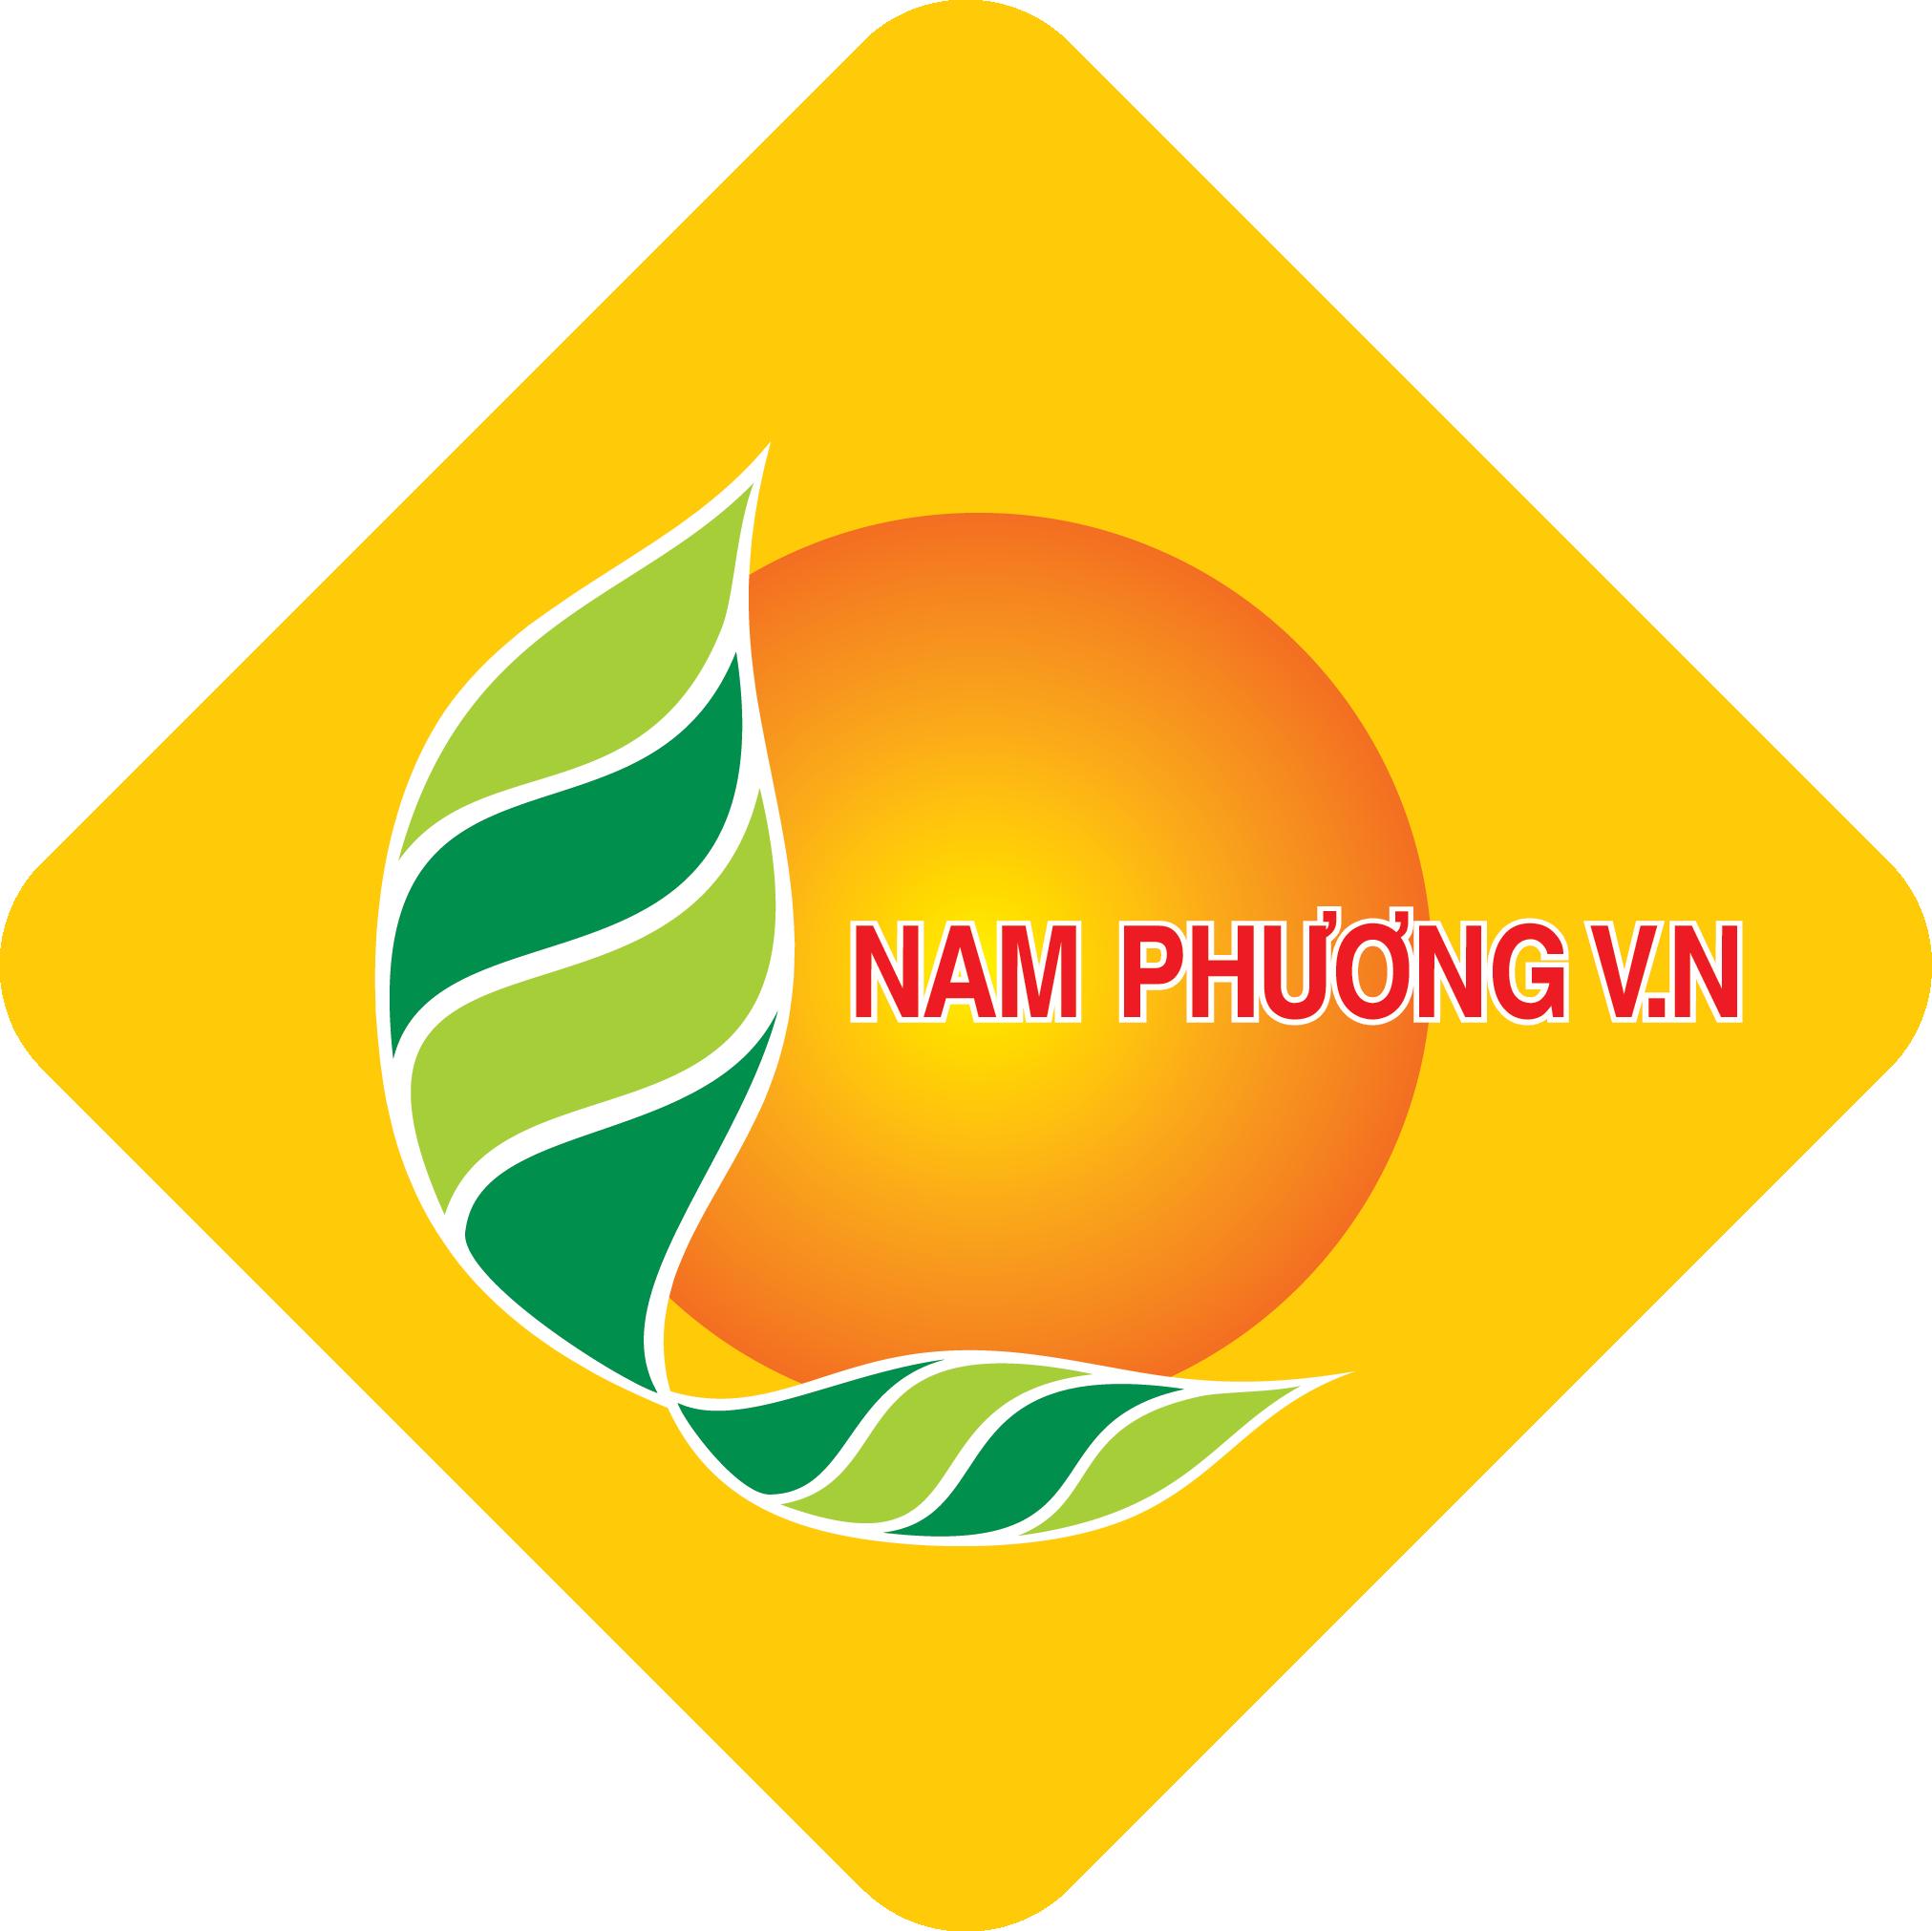 logo-nam-phuong